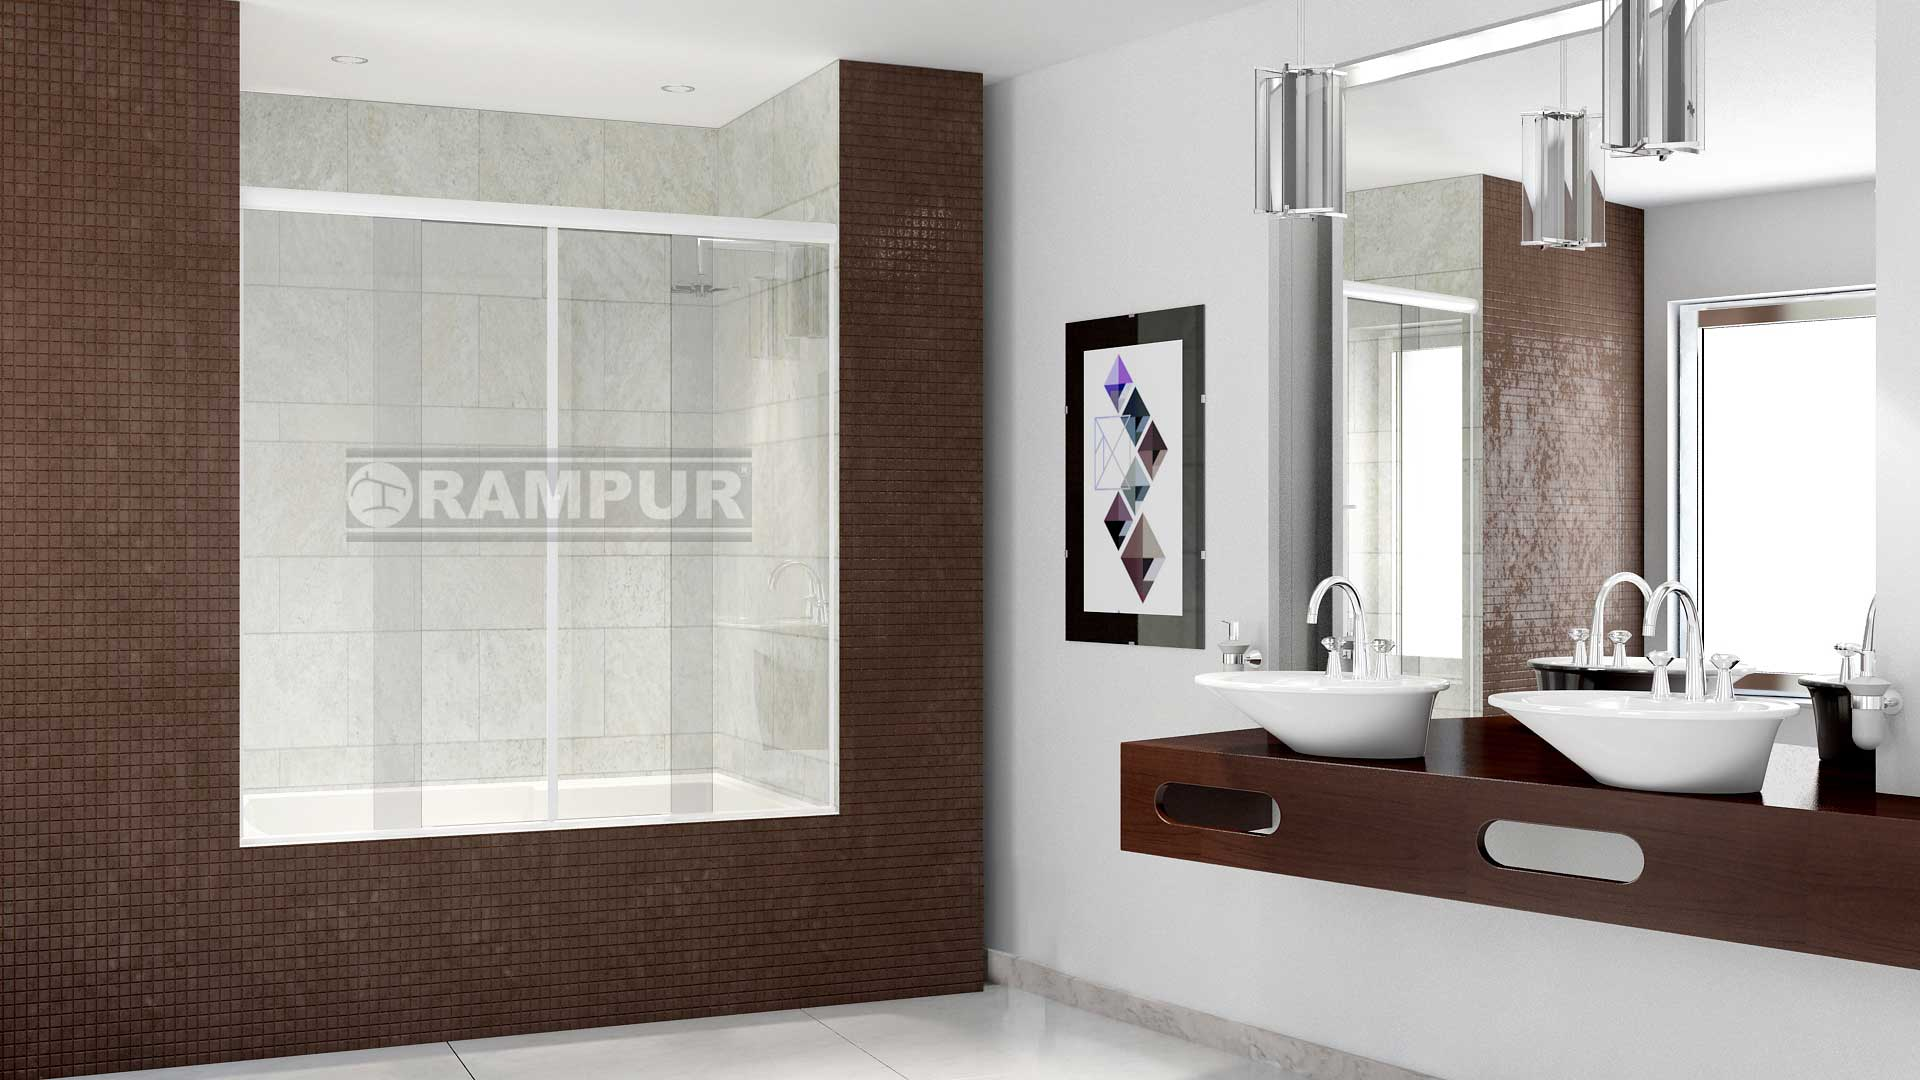 Mamparas Para Baño Rampur:RAMPUR ® :: OFERTA Mamparas Para Baño Precios Bajos